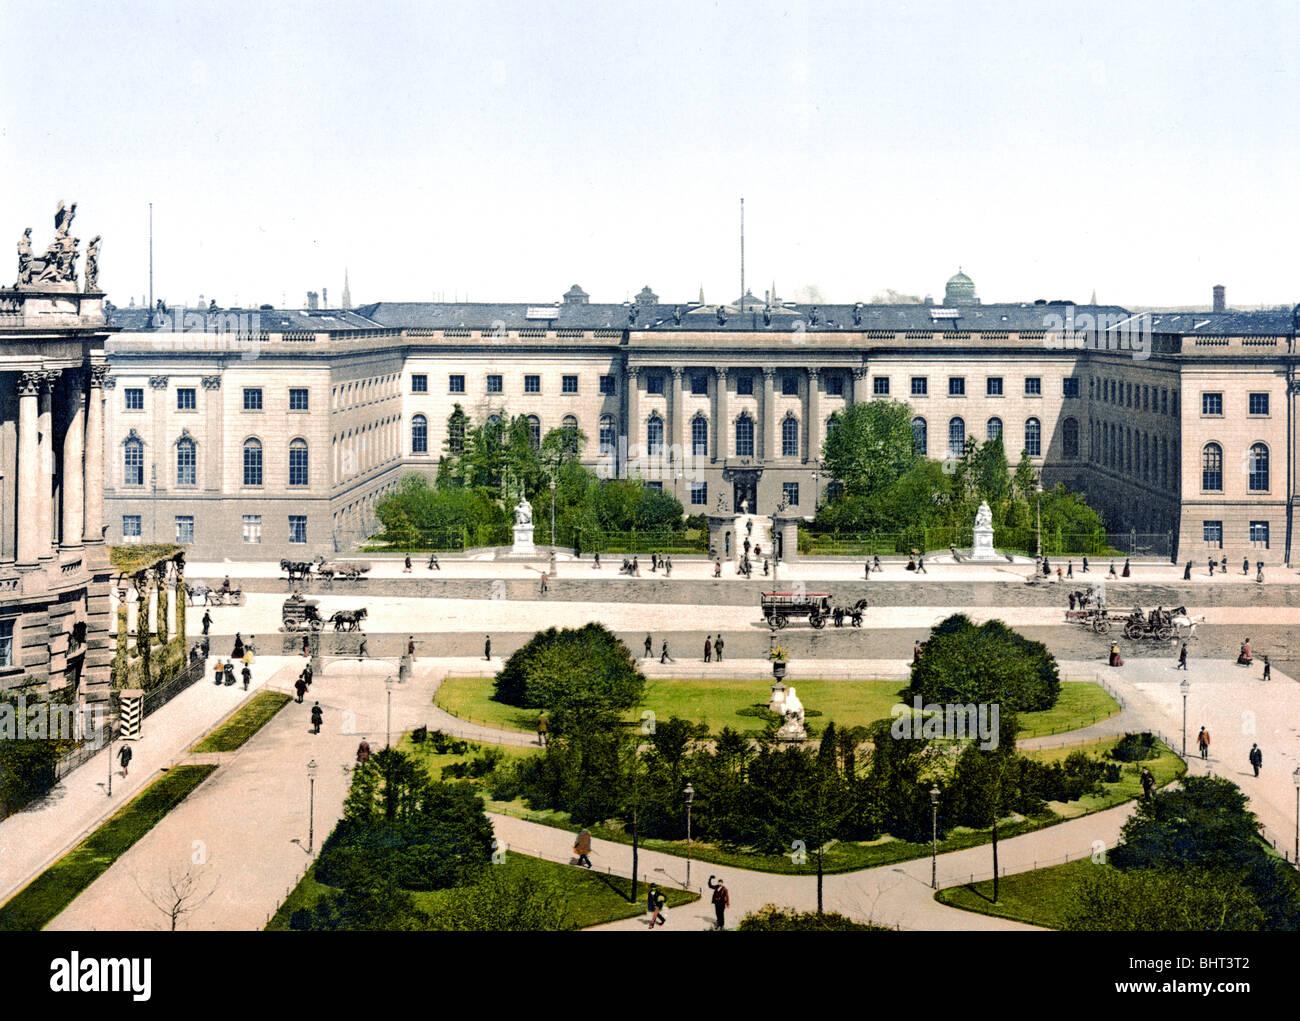 Die Universität Berlin - Stock Image